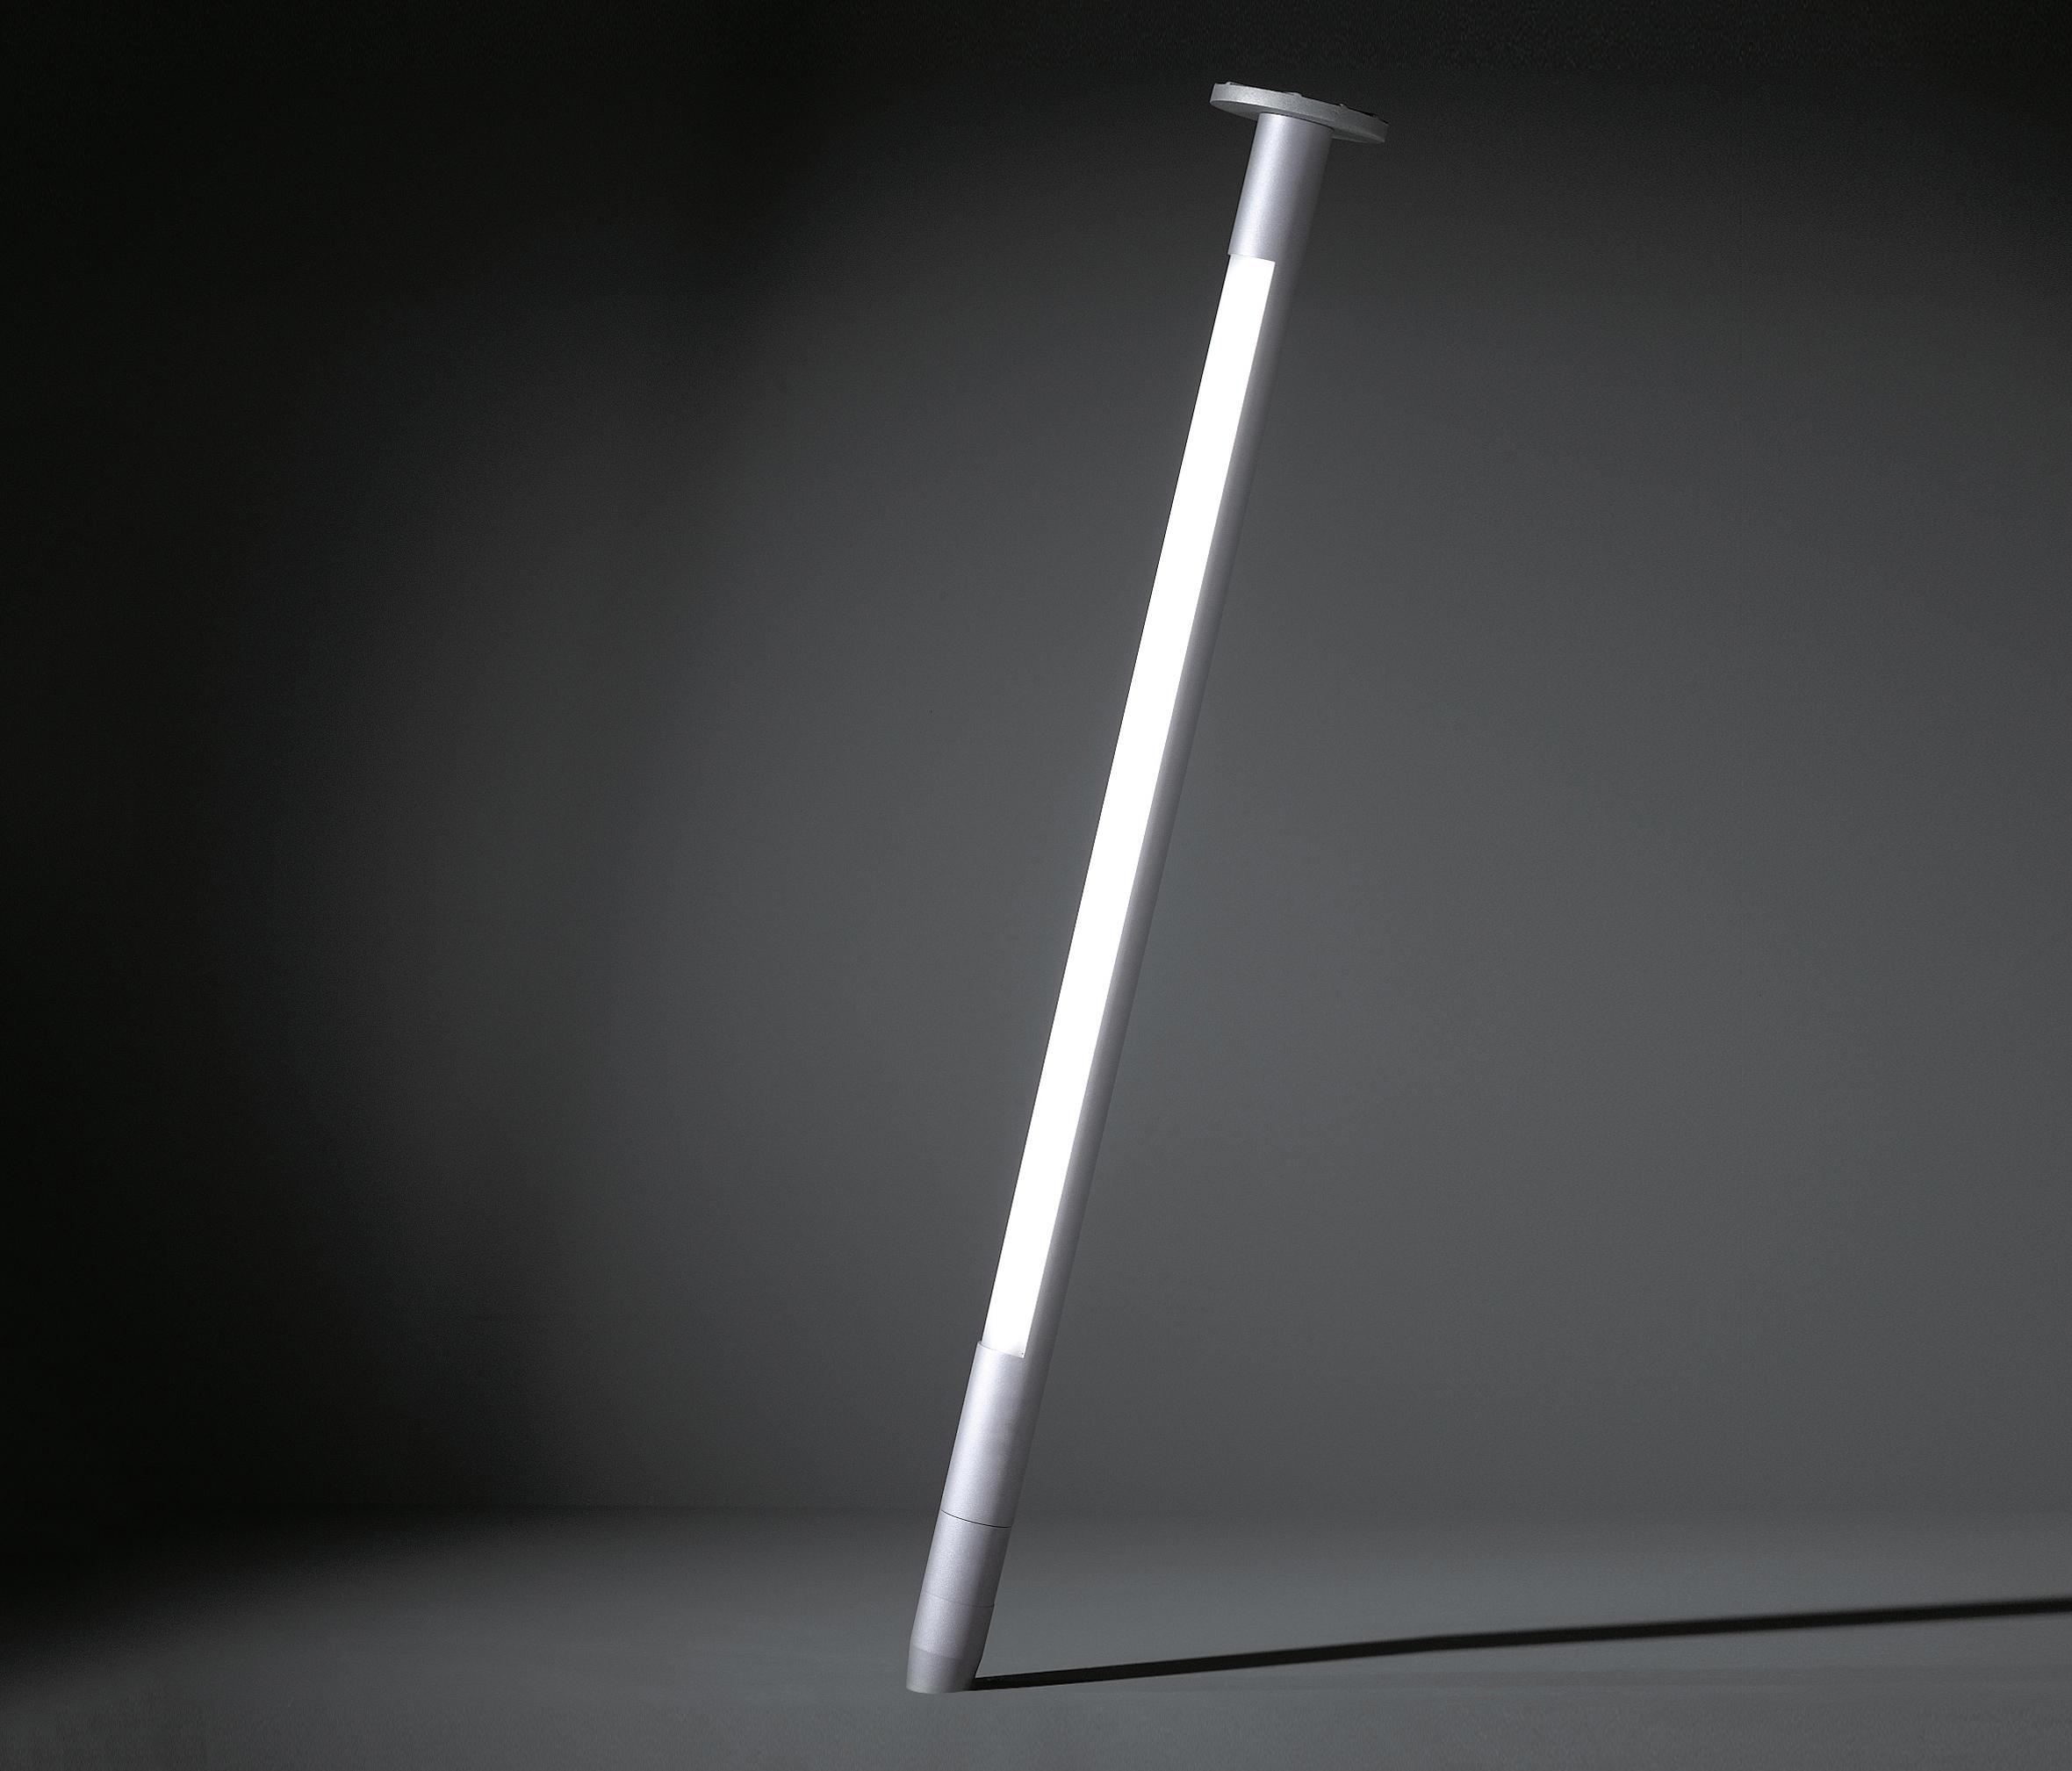 Hit-me IP55 TL5 GI by Modular Lighting Instruments | Floor lights ... & HIT-ME IP55 TL5 GI - Floor lights from Modular Lighting ... azcodes.com